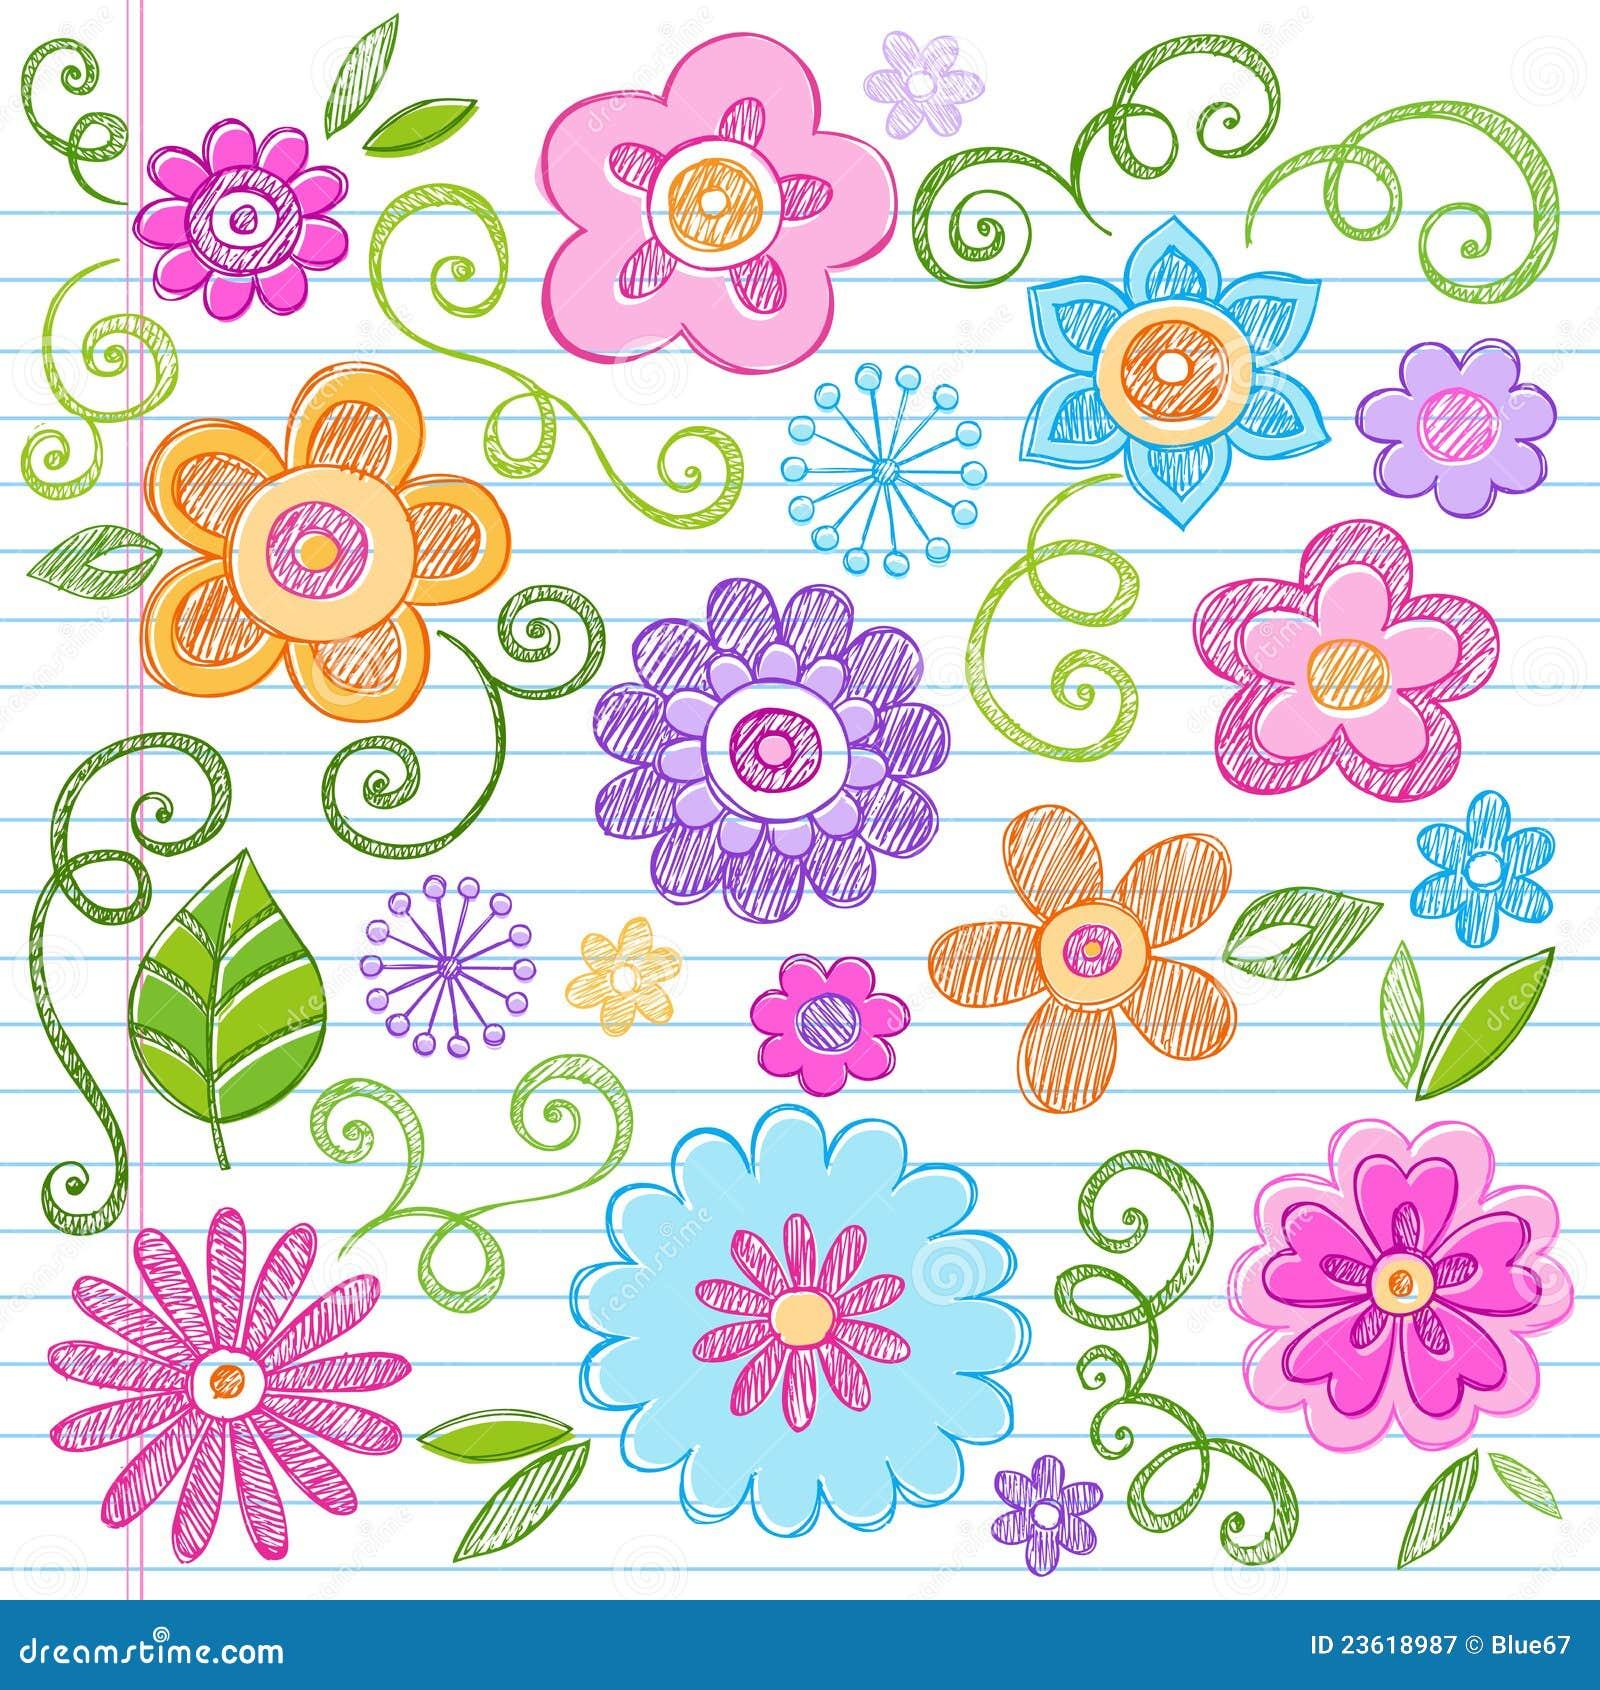 Flüchtiges Blumen-Notizbuch kritzelt vektorset